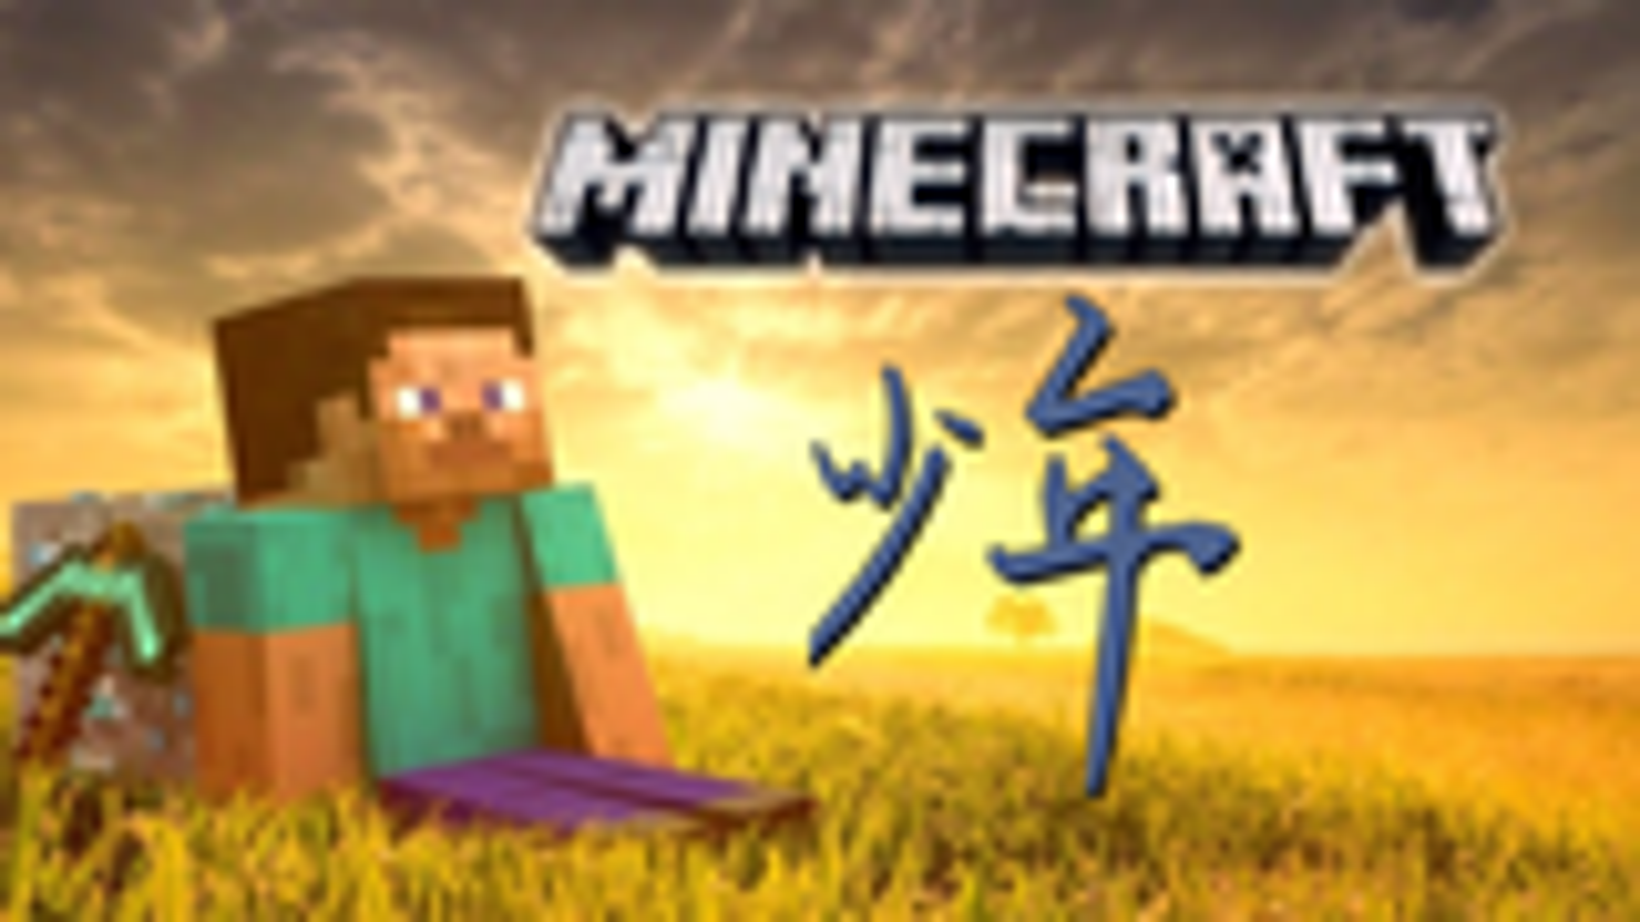 【Minecraft/少年】你还是从前那个麦块,没有一丝丝改变……